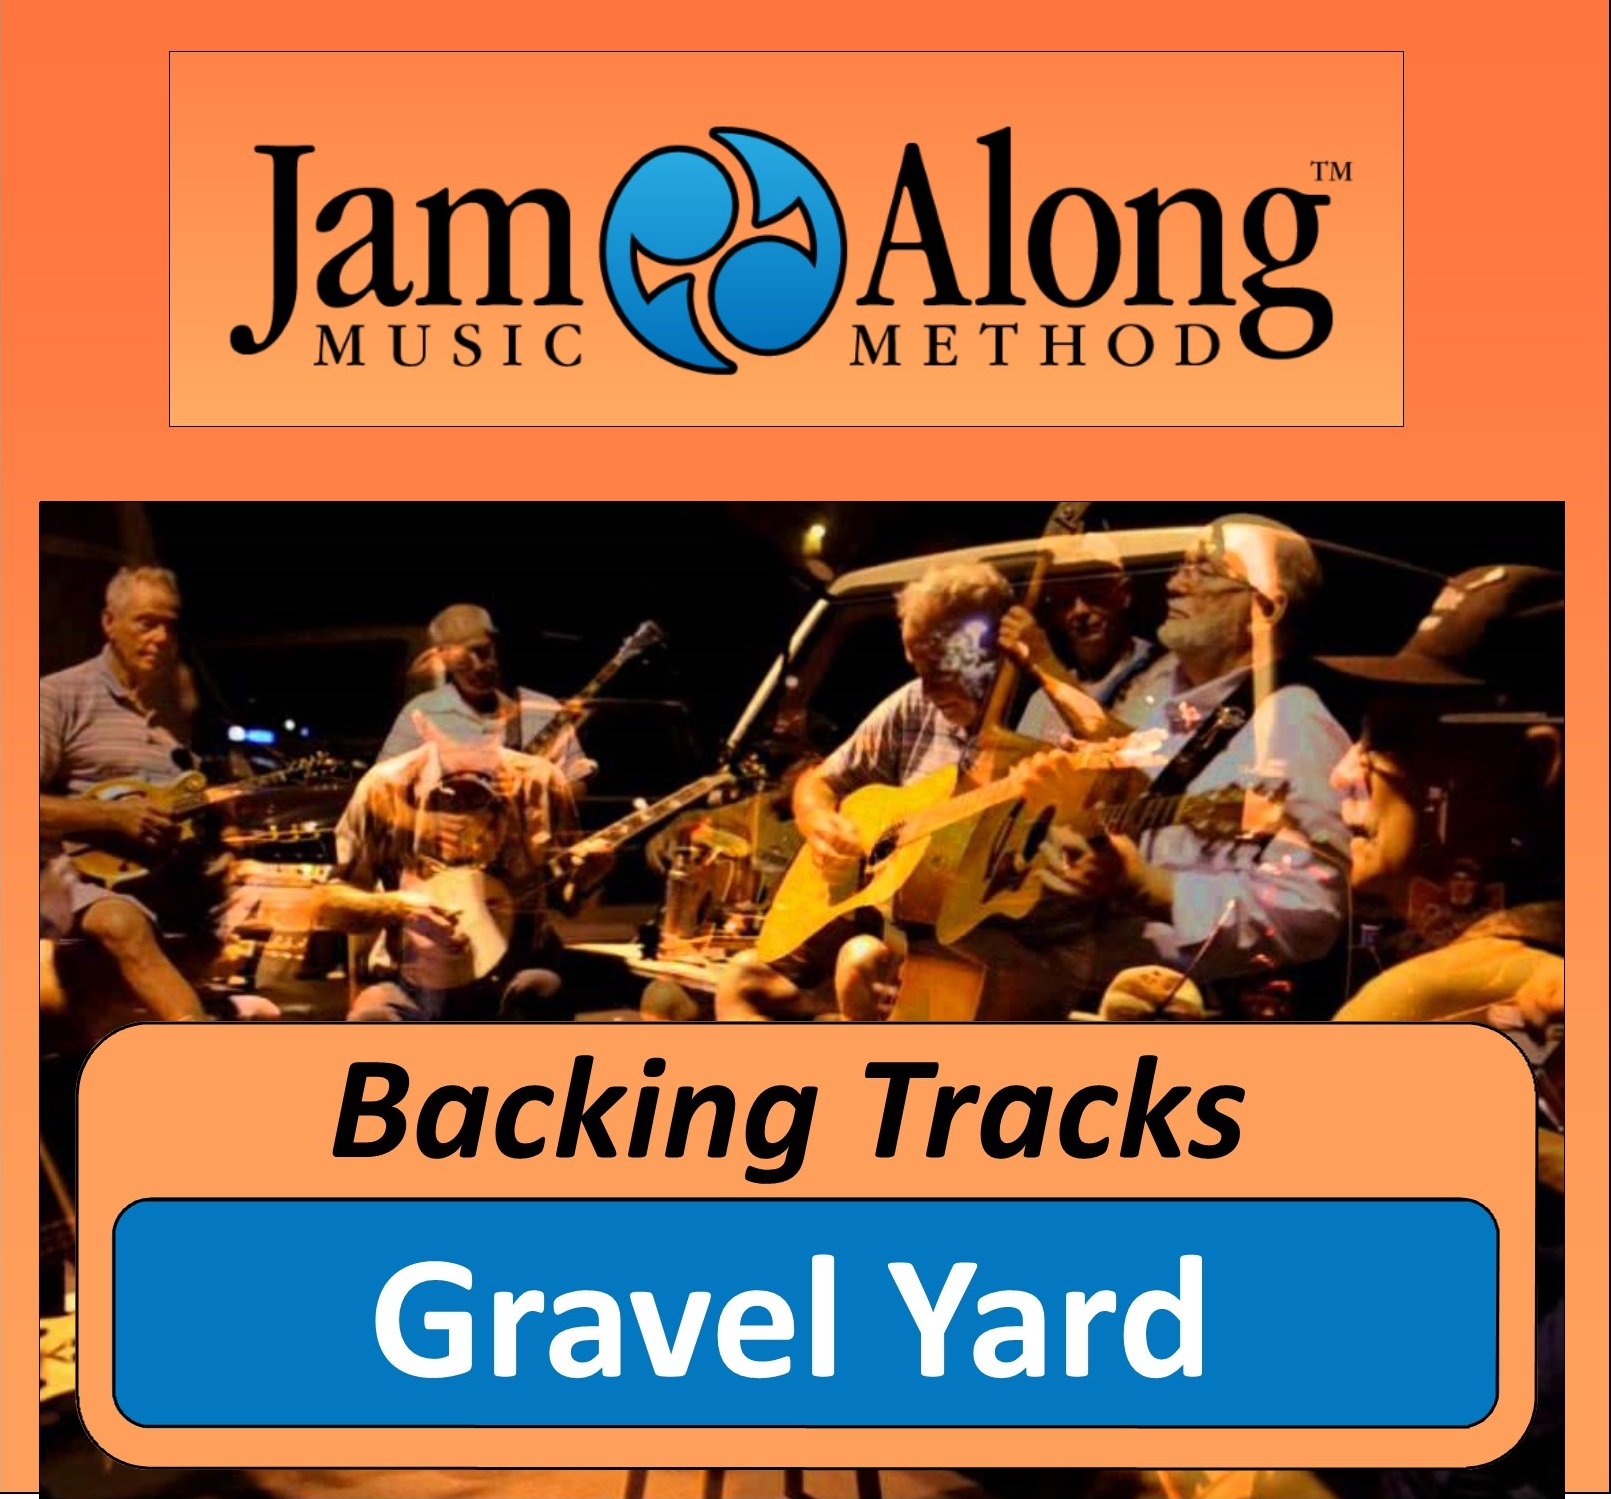 Gravel Yard - Backing Tracks